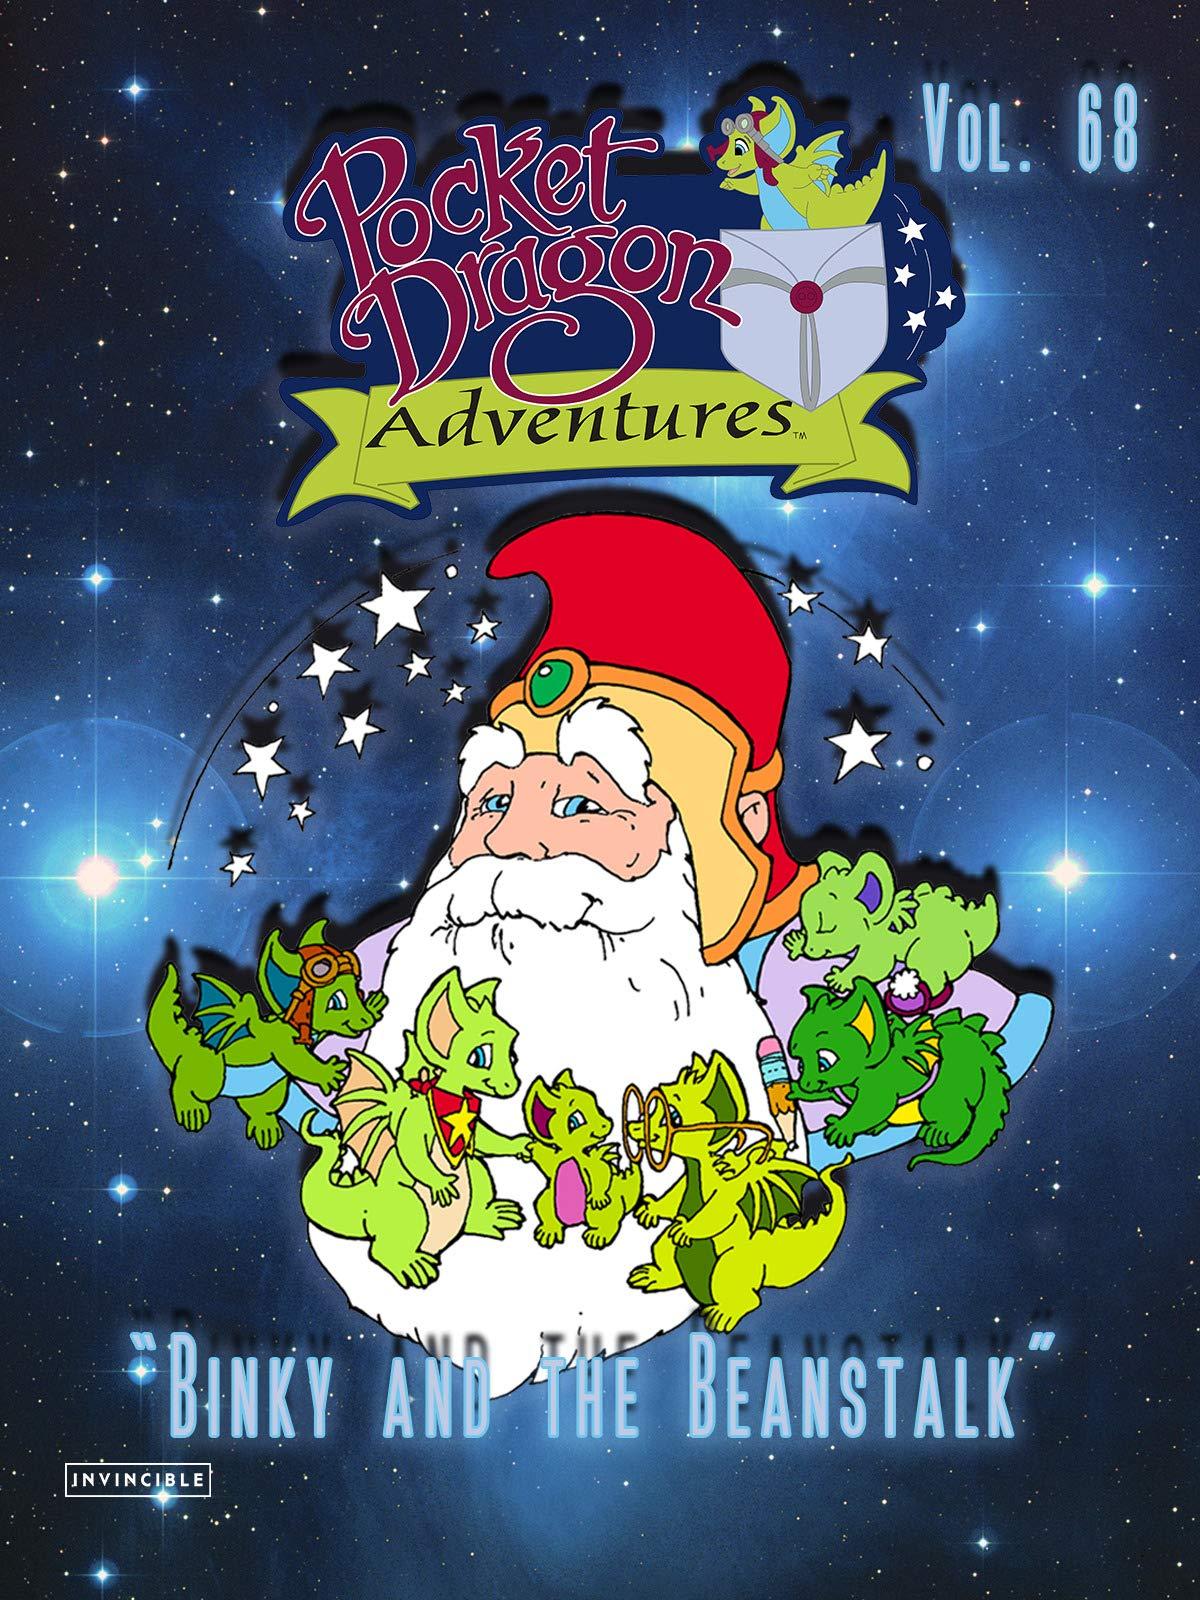 Pocket Dragon Adventures Vol. 68Binky and the Beanstalk